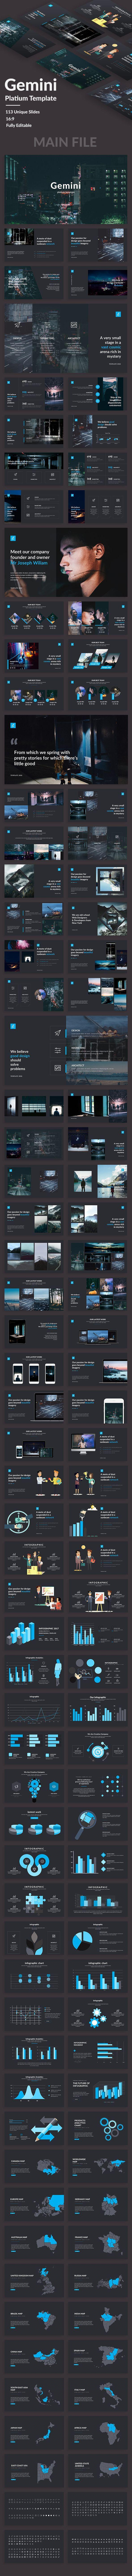 Best 25 ppt template ideas on pinterest presentation design gemini platium powerpoint template toneelgroepblik Image collections